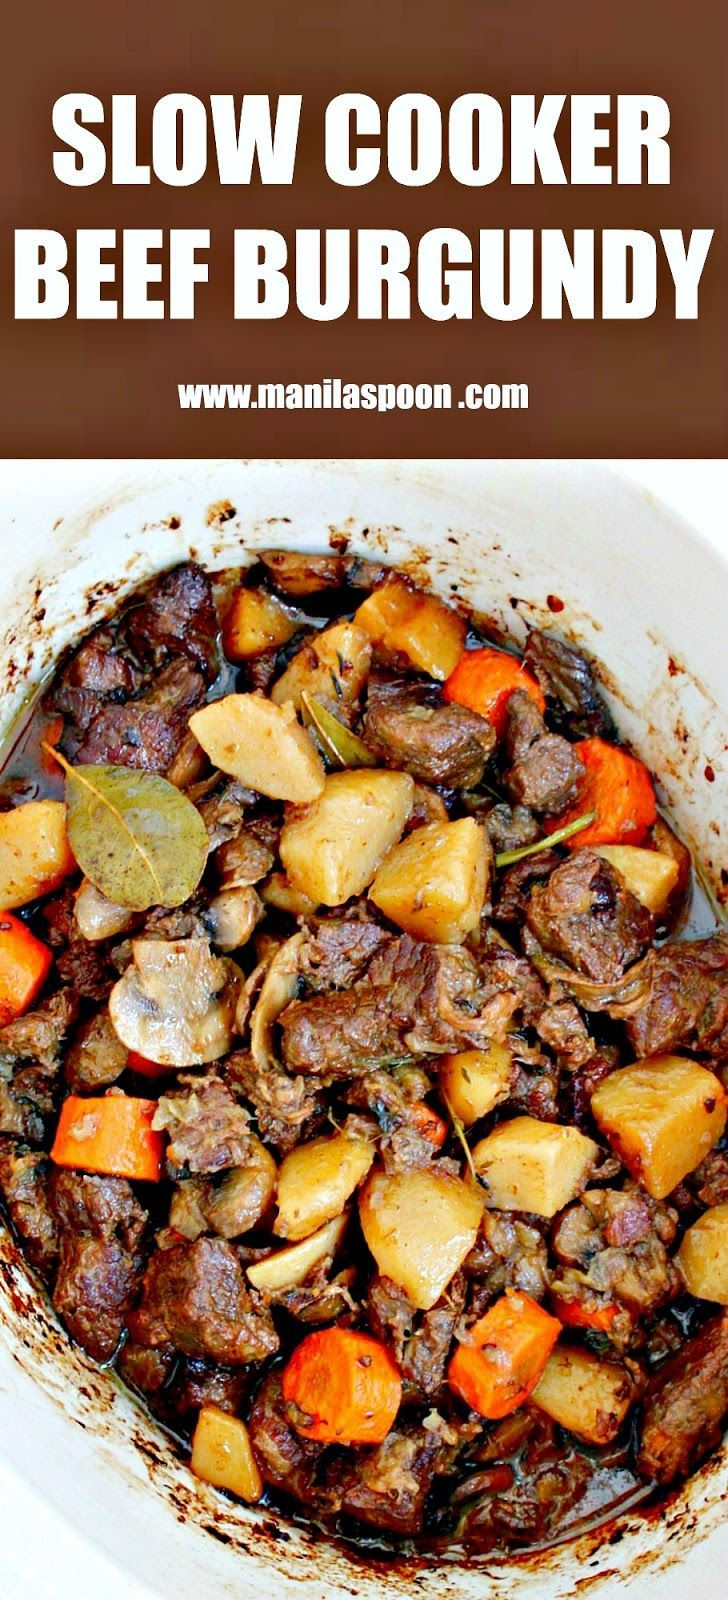 ... Beef Stew on Pinterest | Beef Stews, Beef Stew Crock Pot and Beef Stew